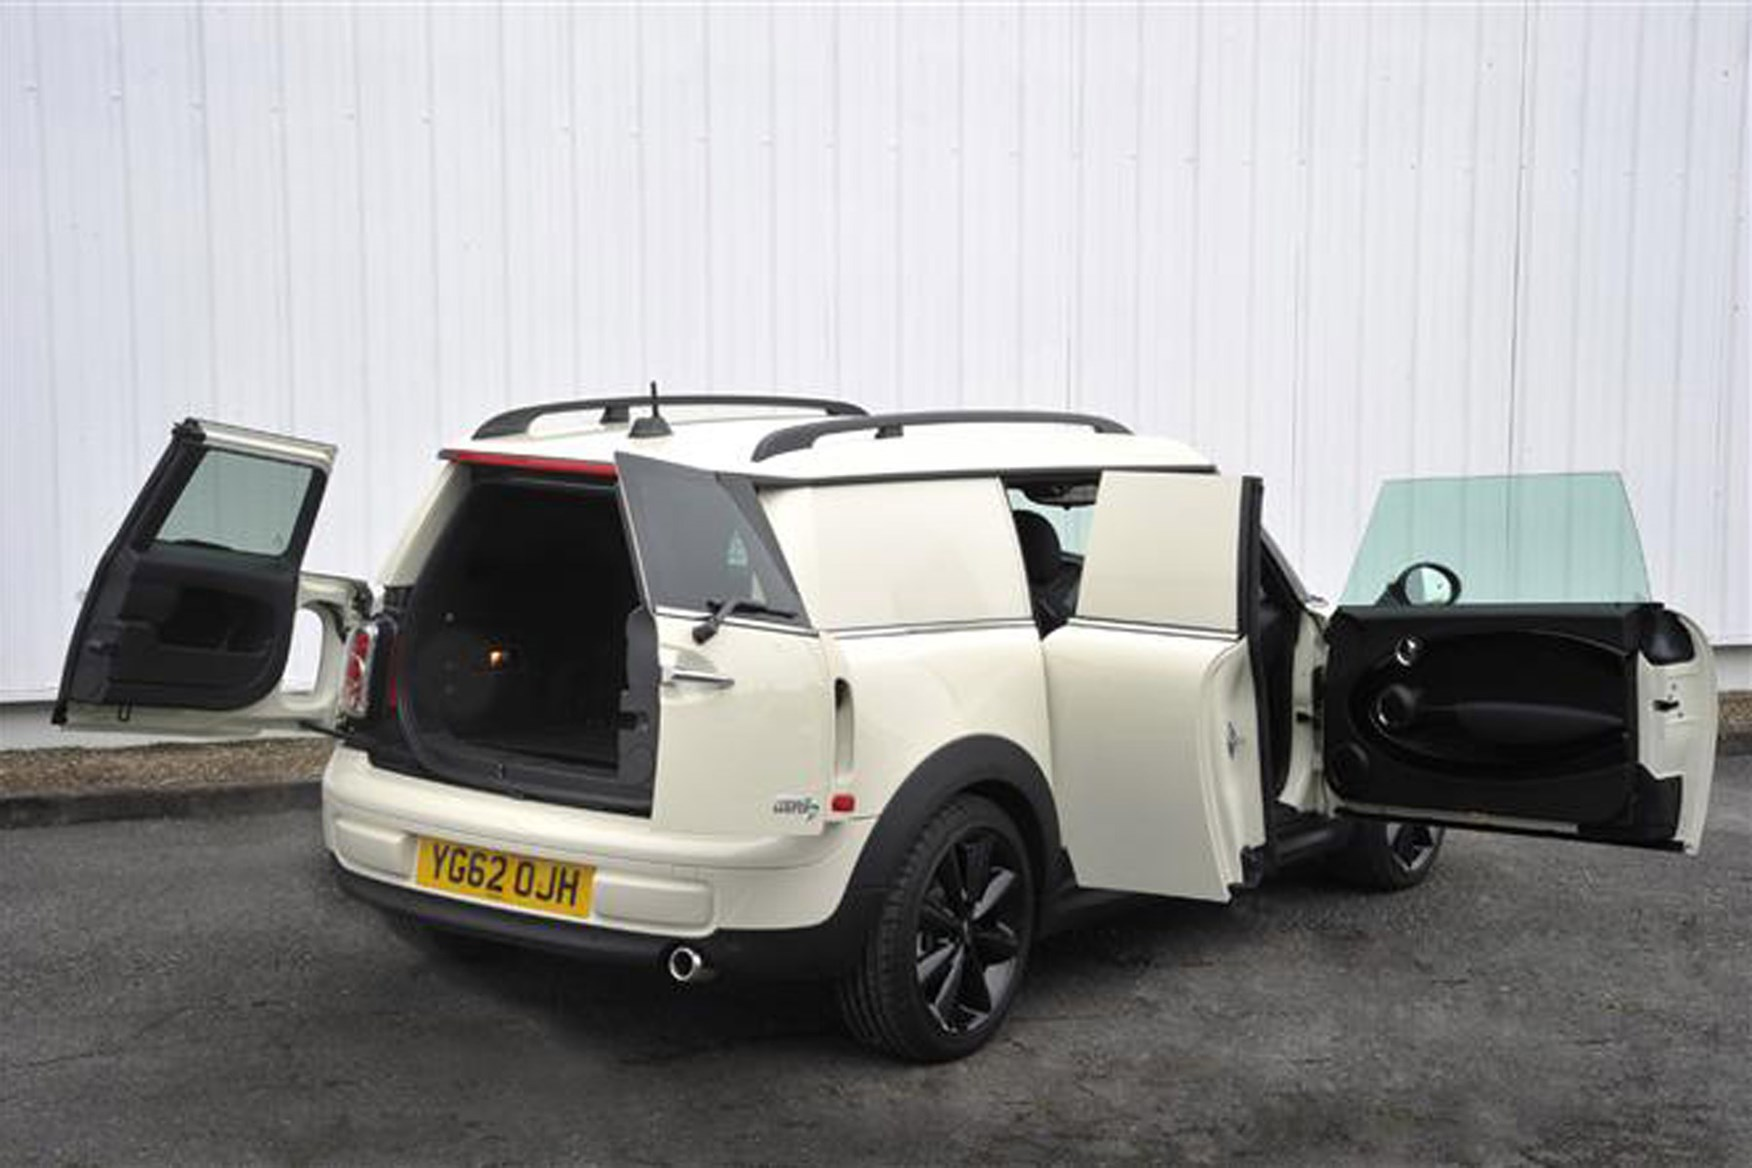 MINI Clubvan review on Parkers Vans - load area access